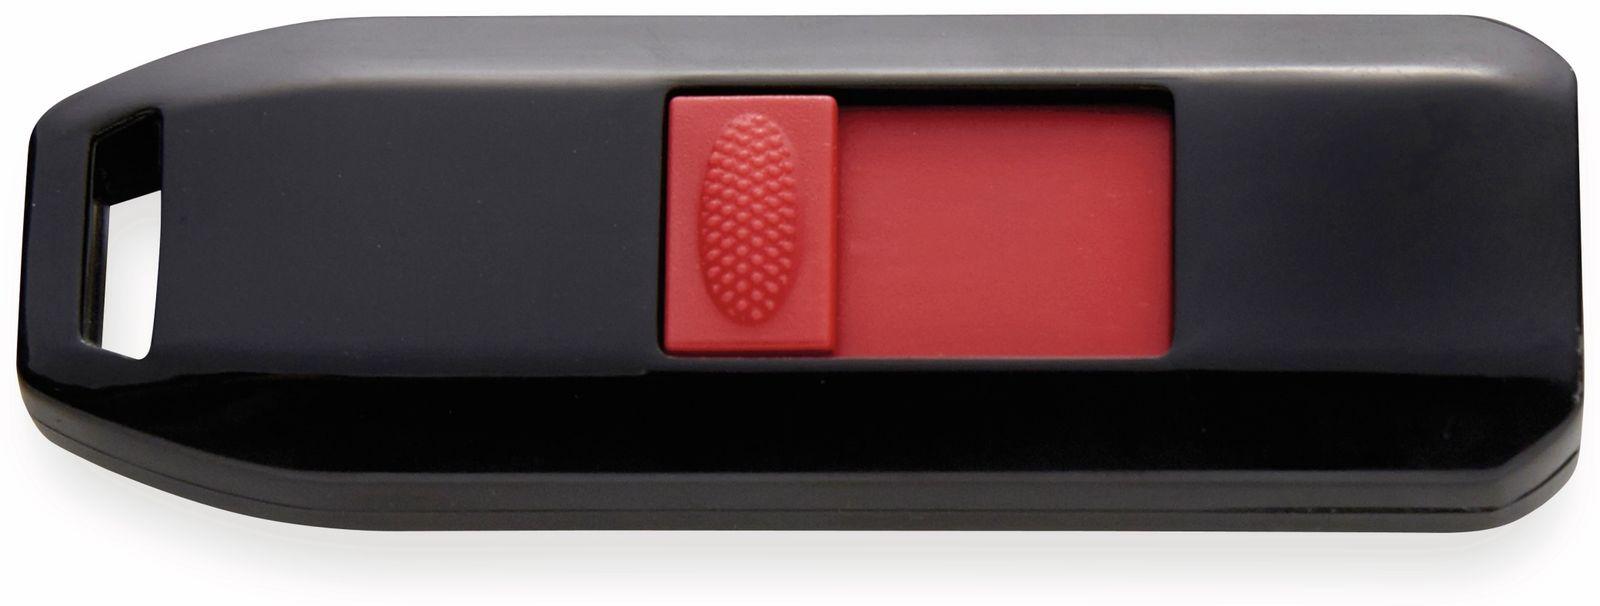 USB2.0 Stick INTENSO Business Line, 32GB